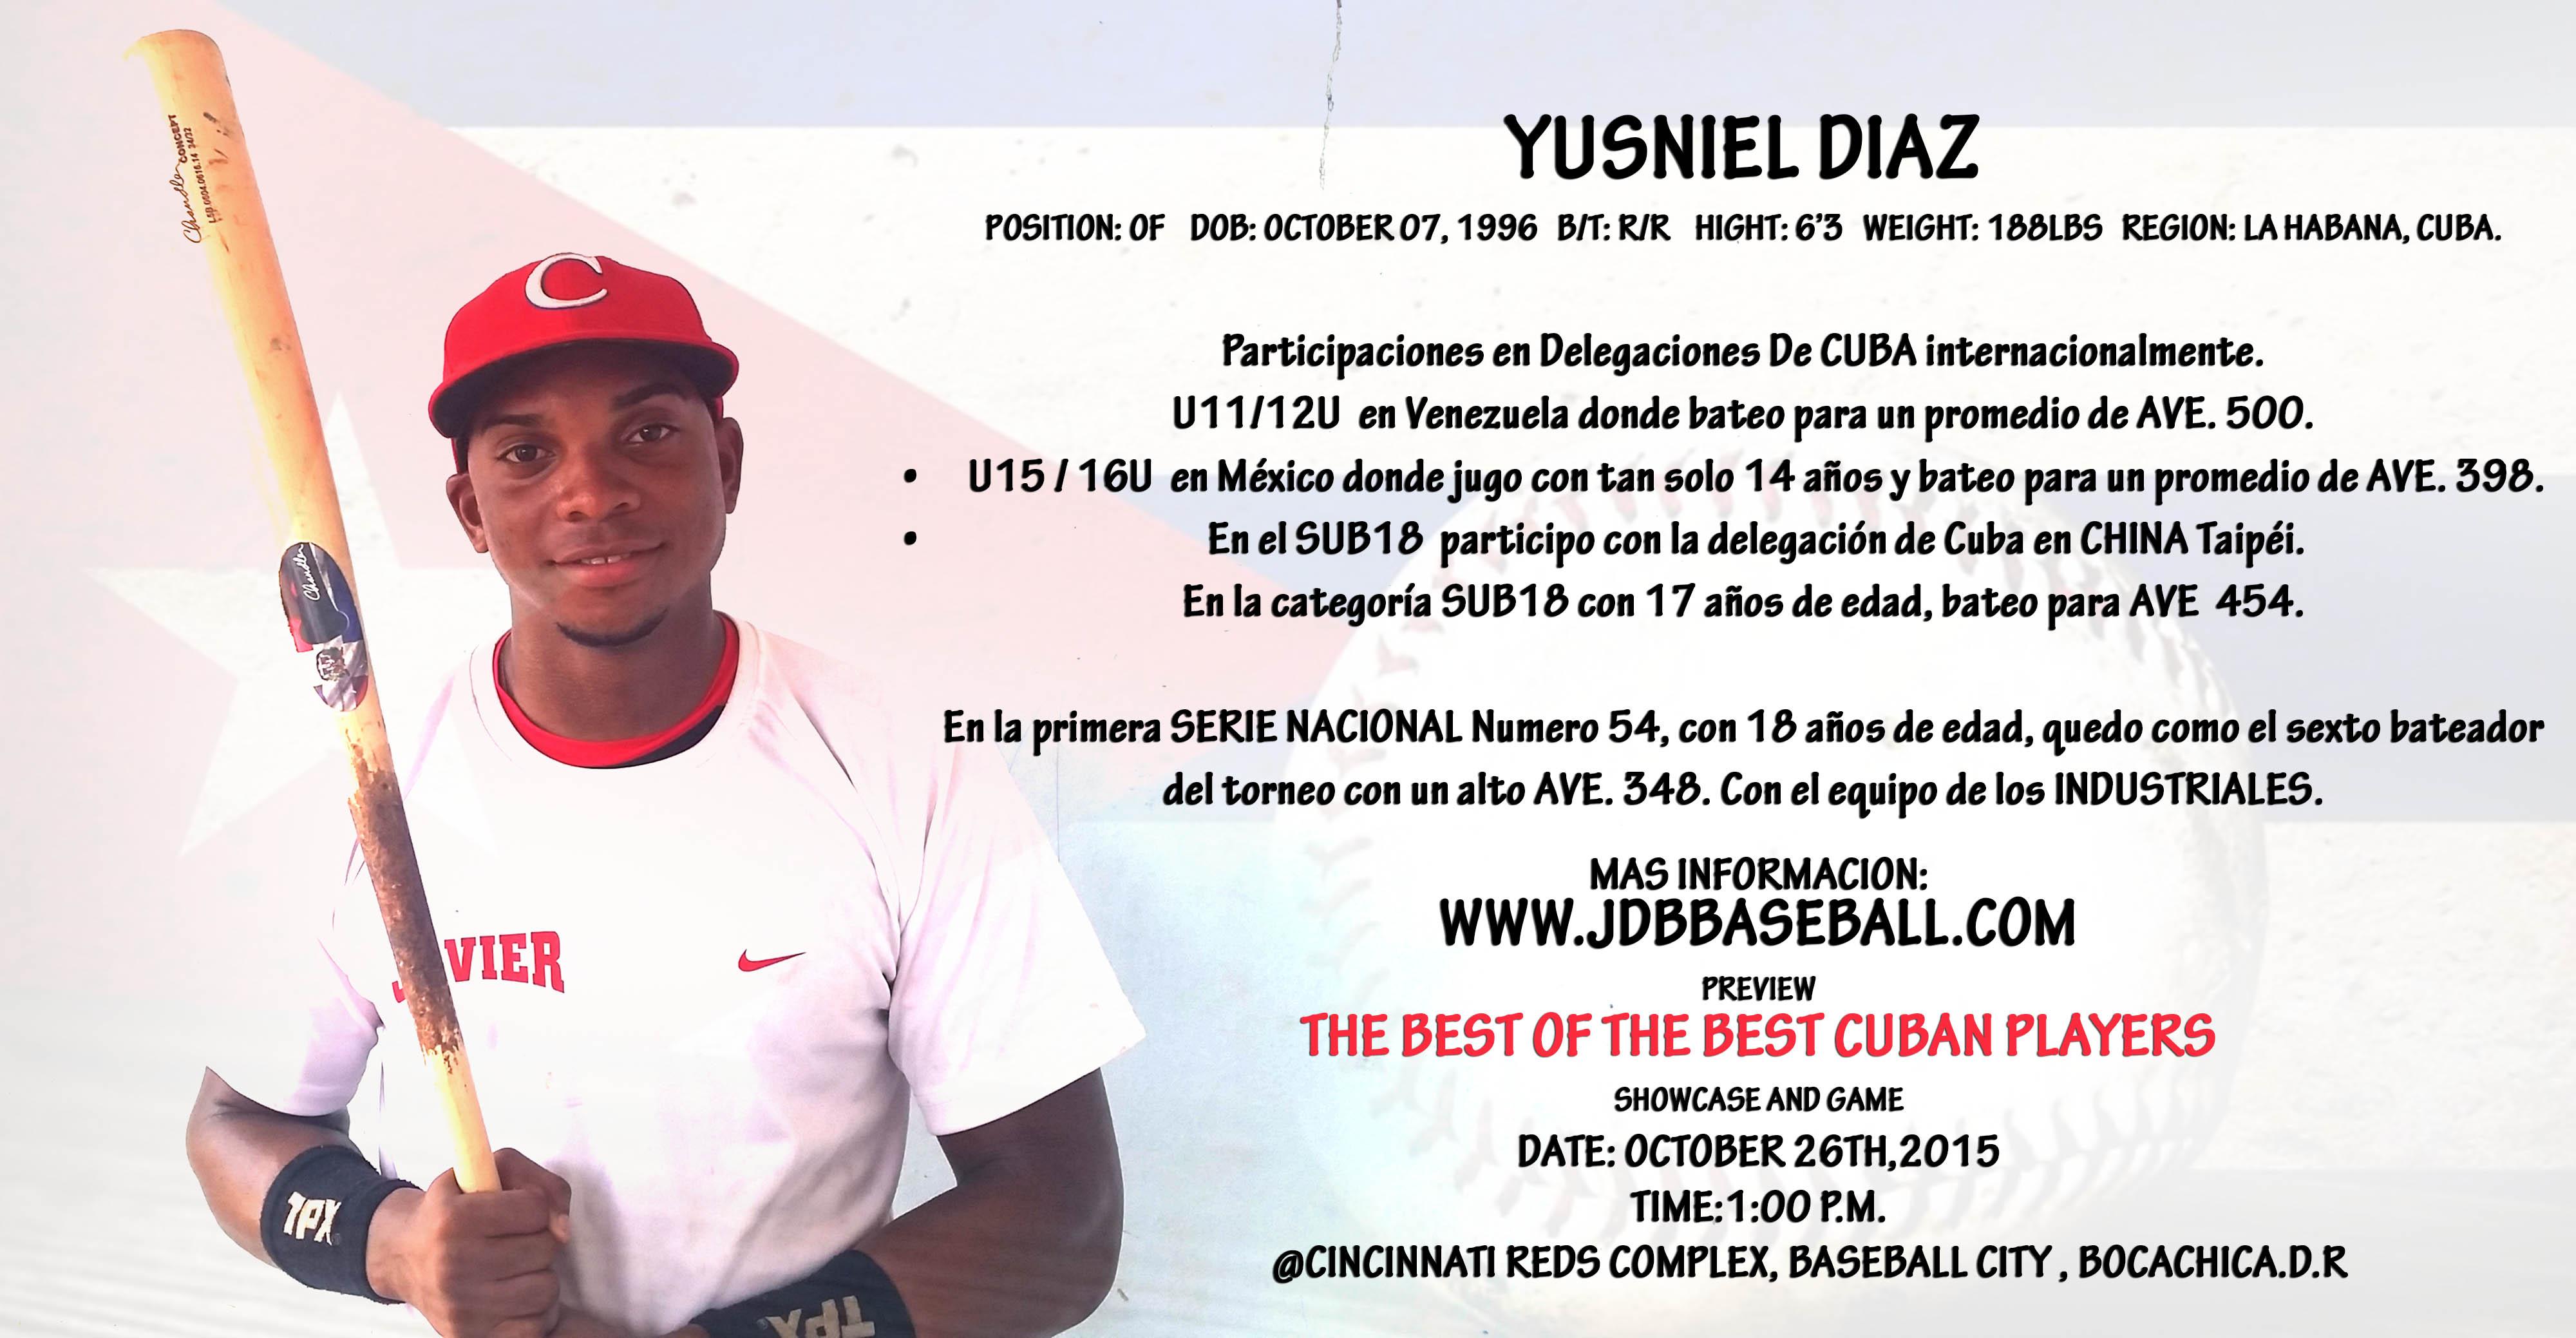 Yusniel Diaz